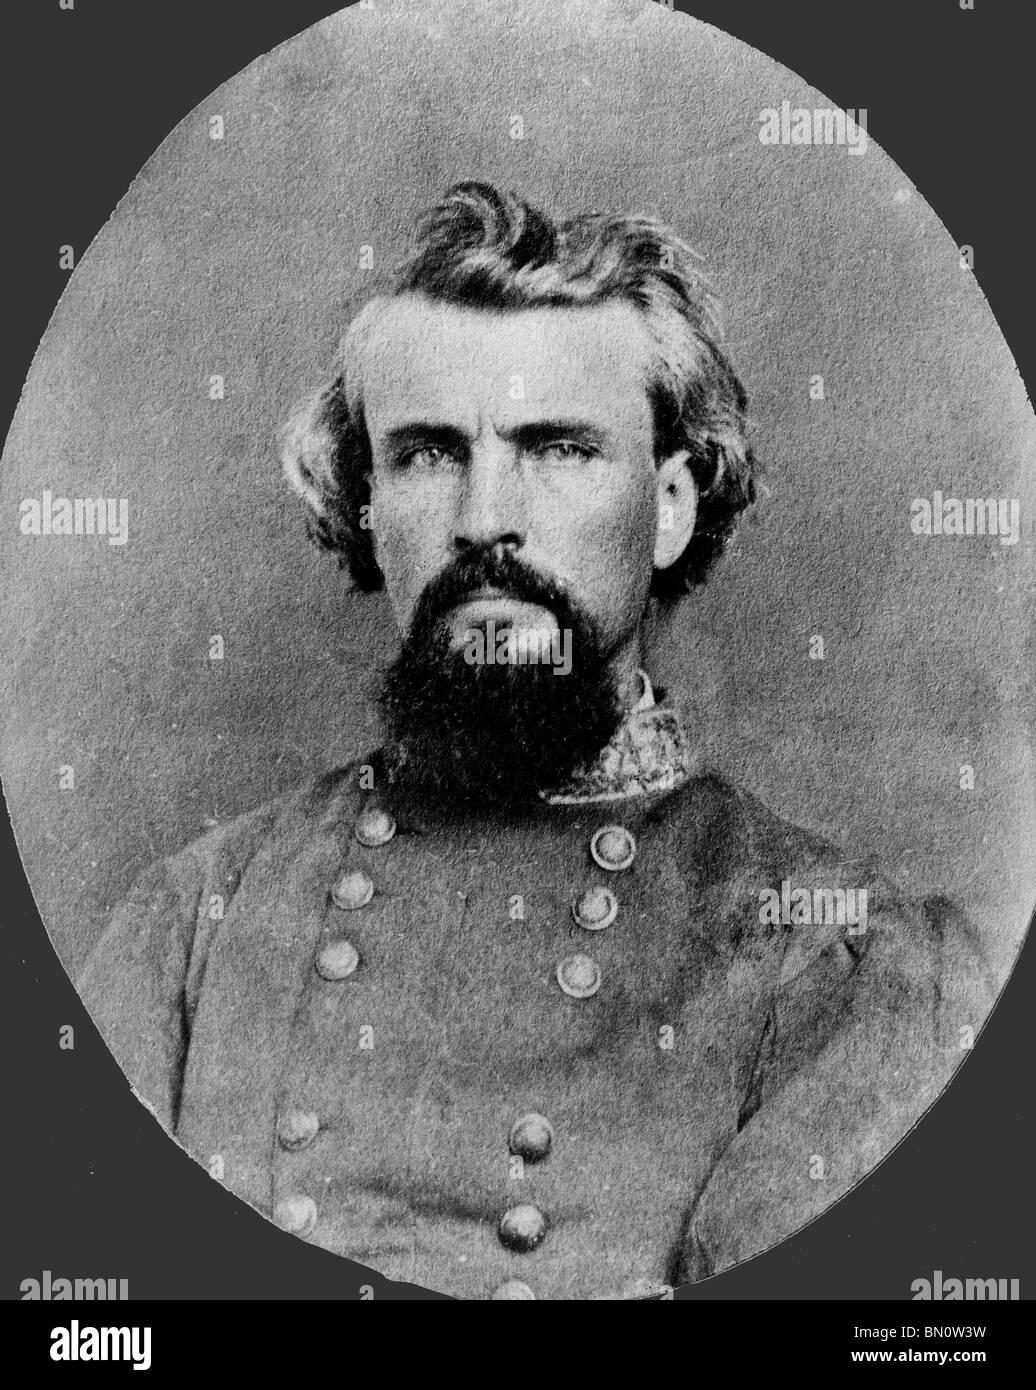 General Nathan B. Forrest - Confederate General - USA Civil War - Stock Image